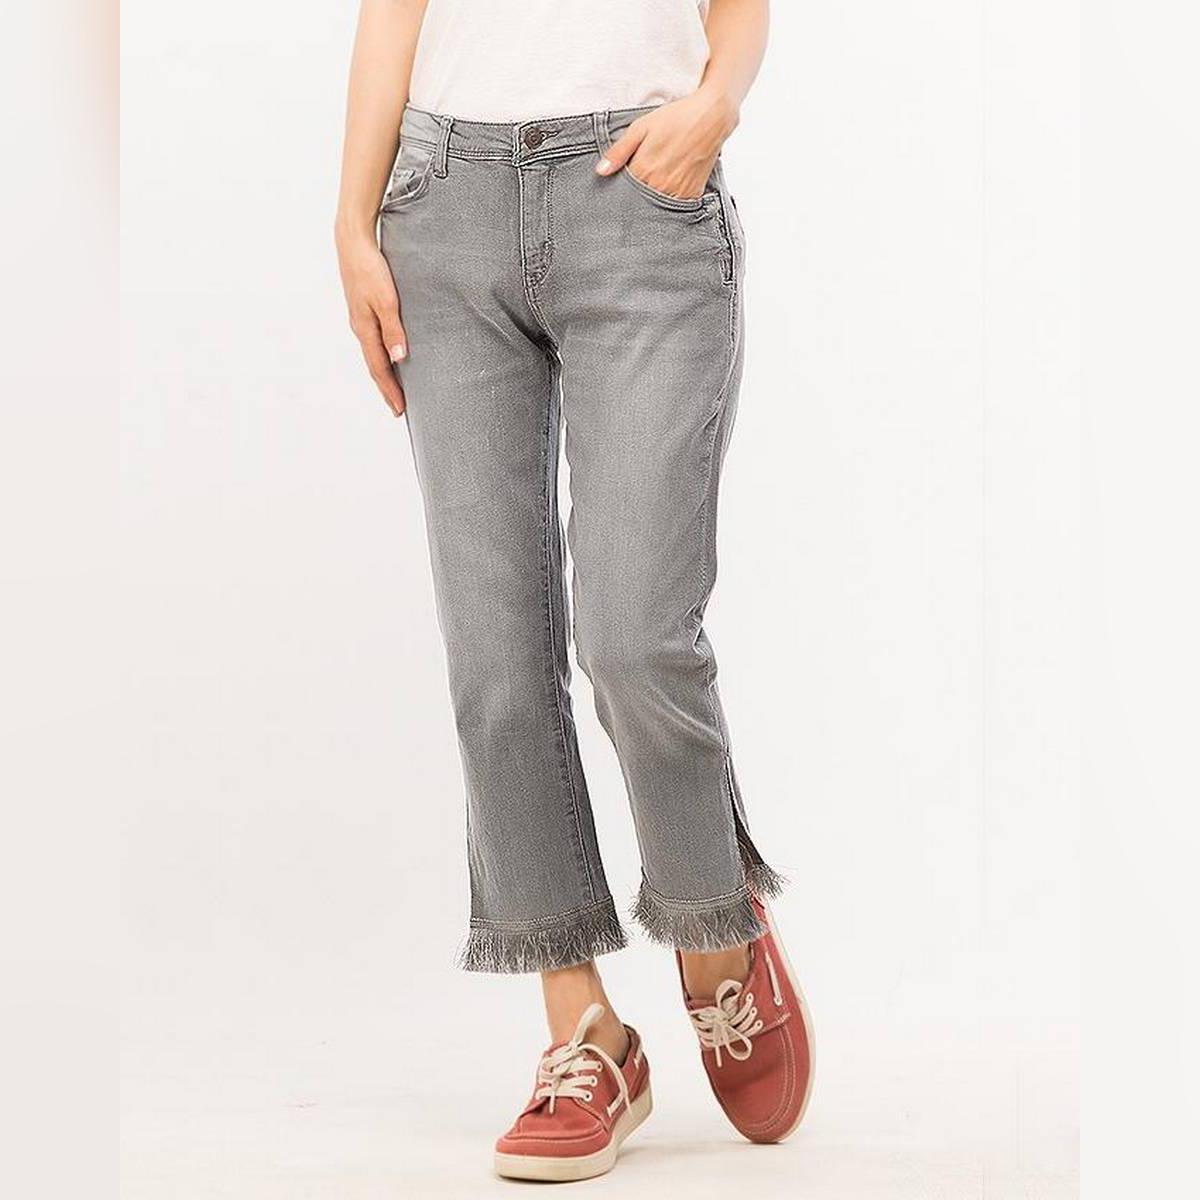 Grey Denim Capri Jeans For Women